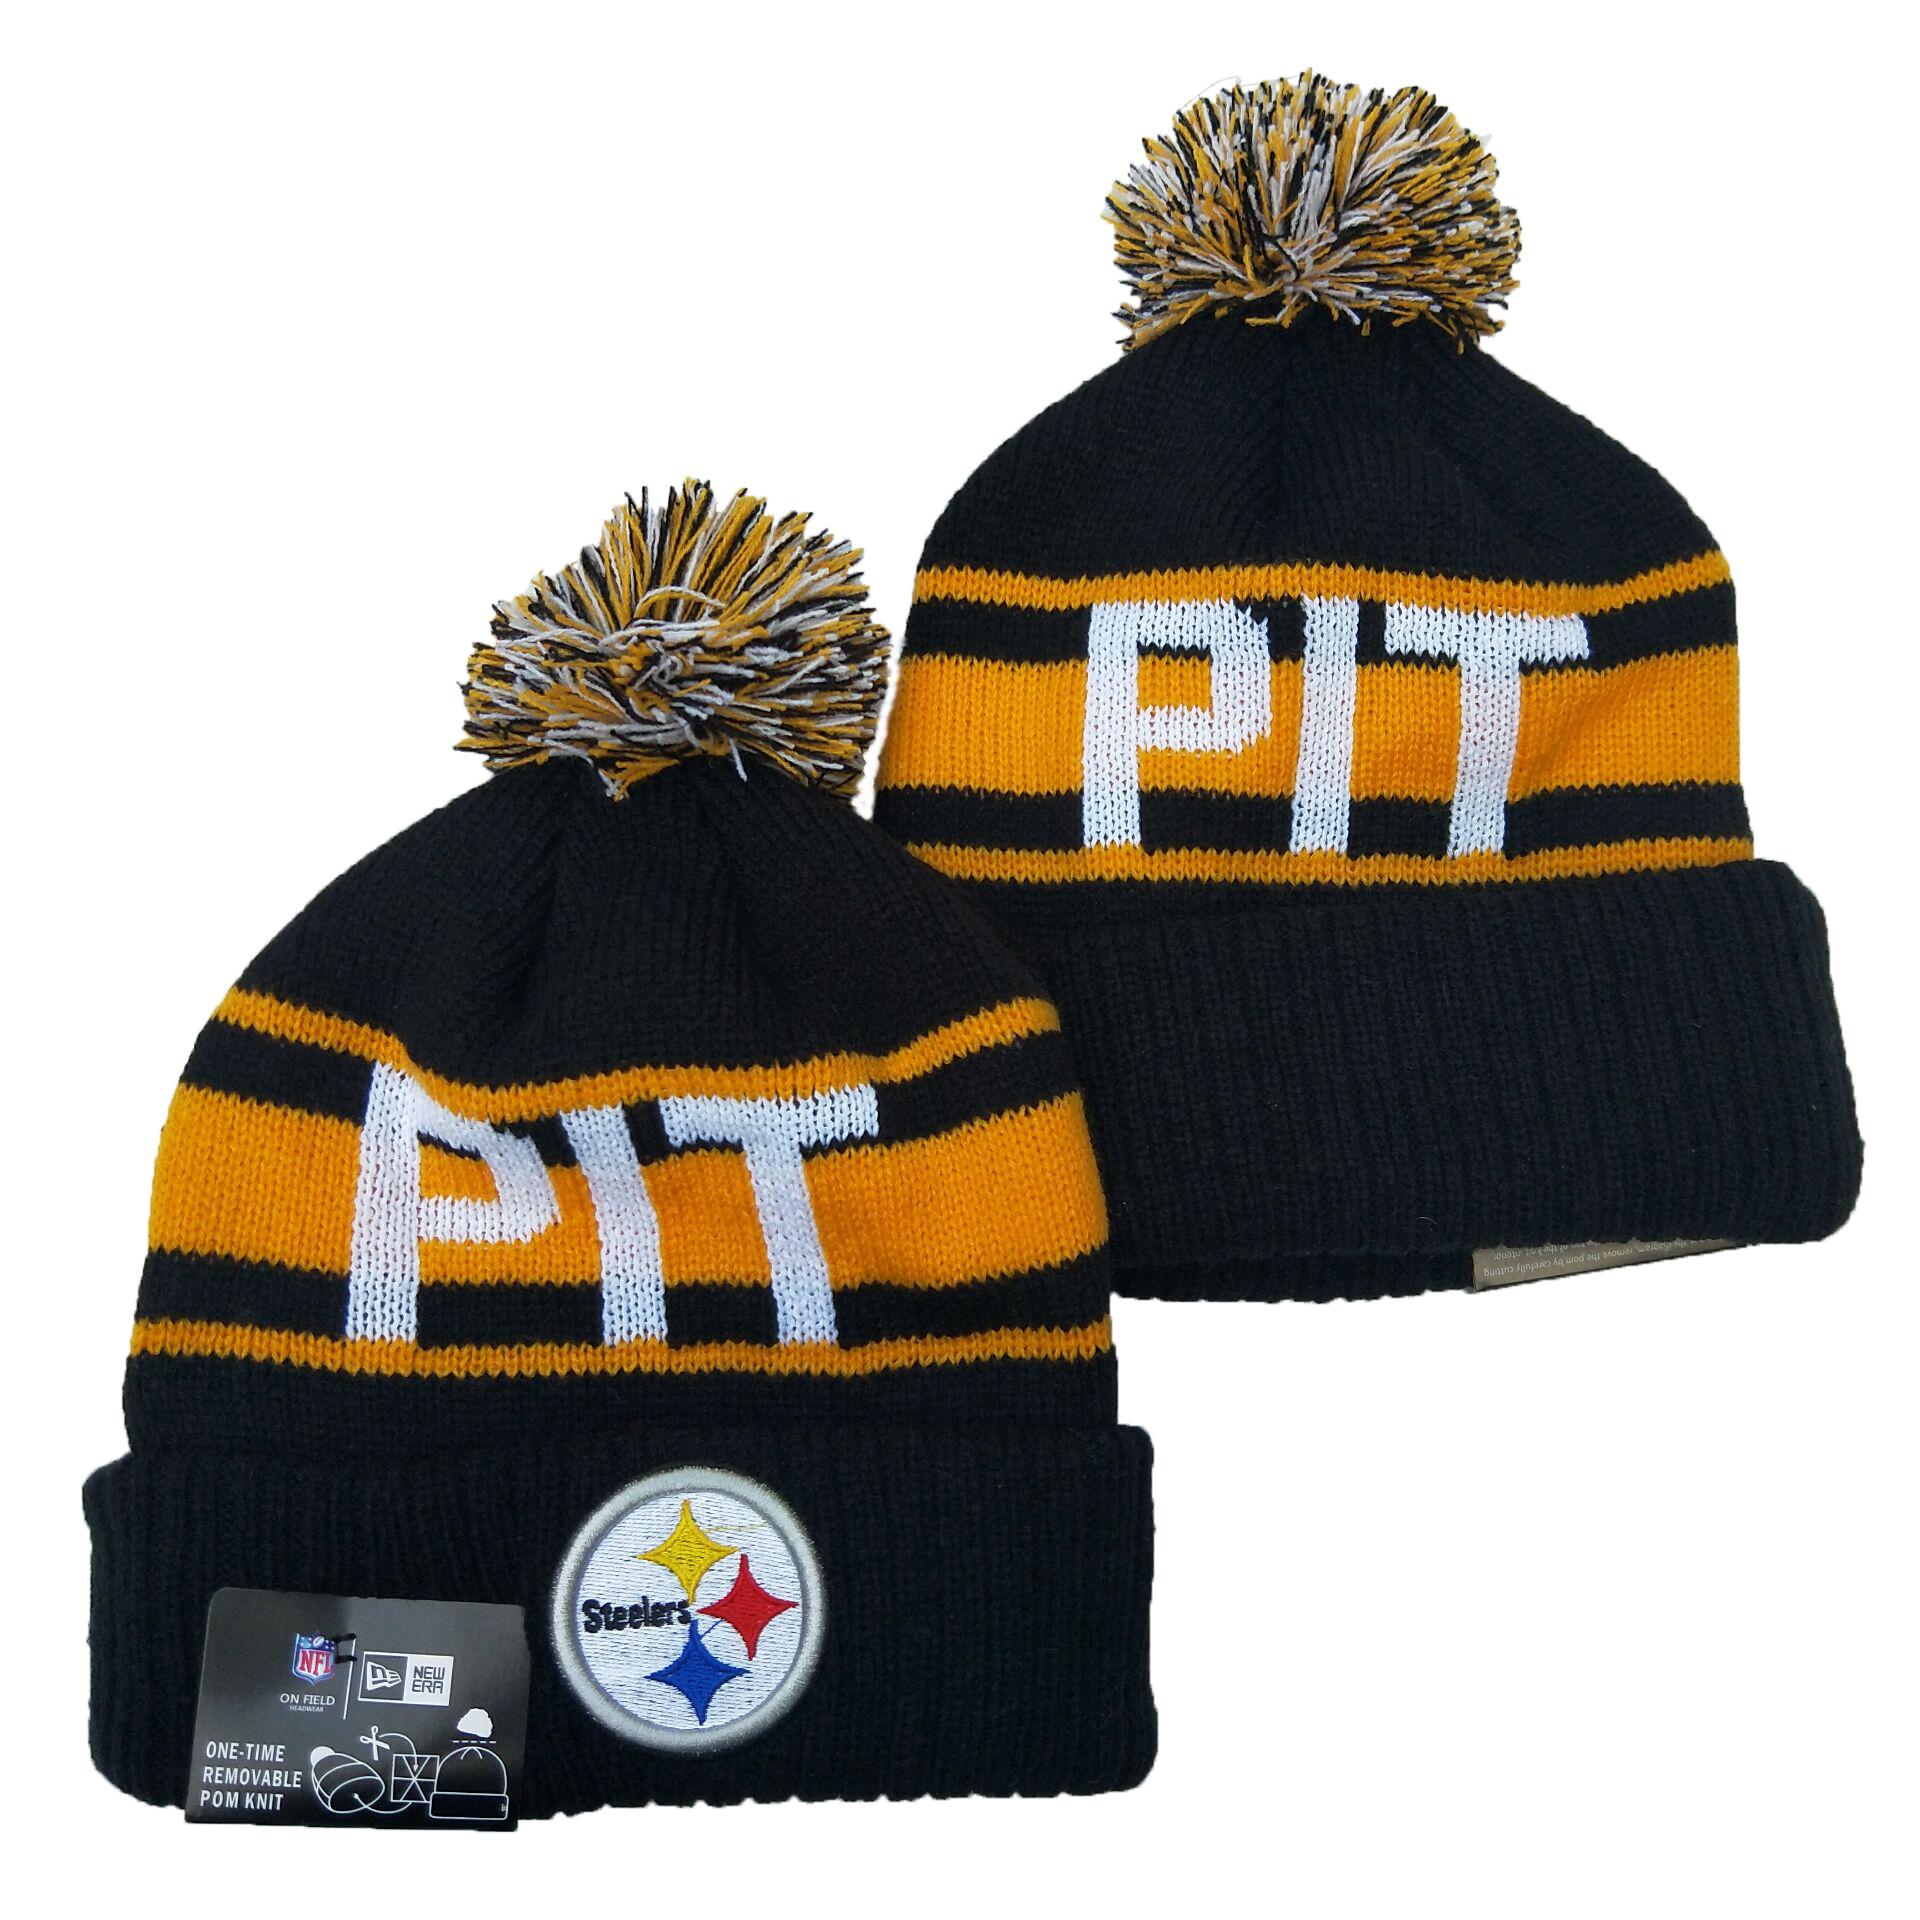 Steelers Team Logo Black Yellow Pom Knit Hat YD